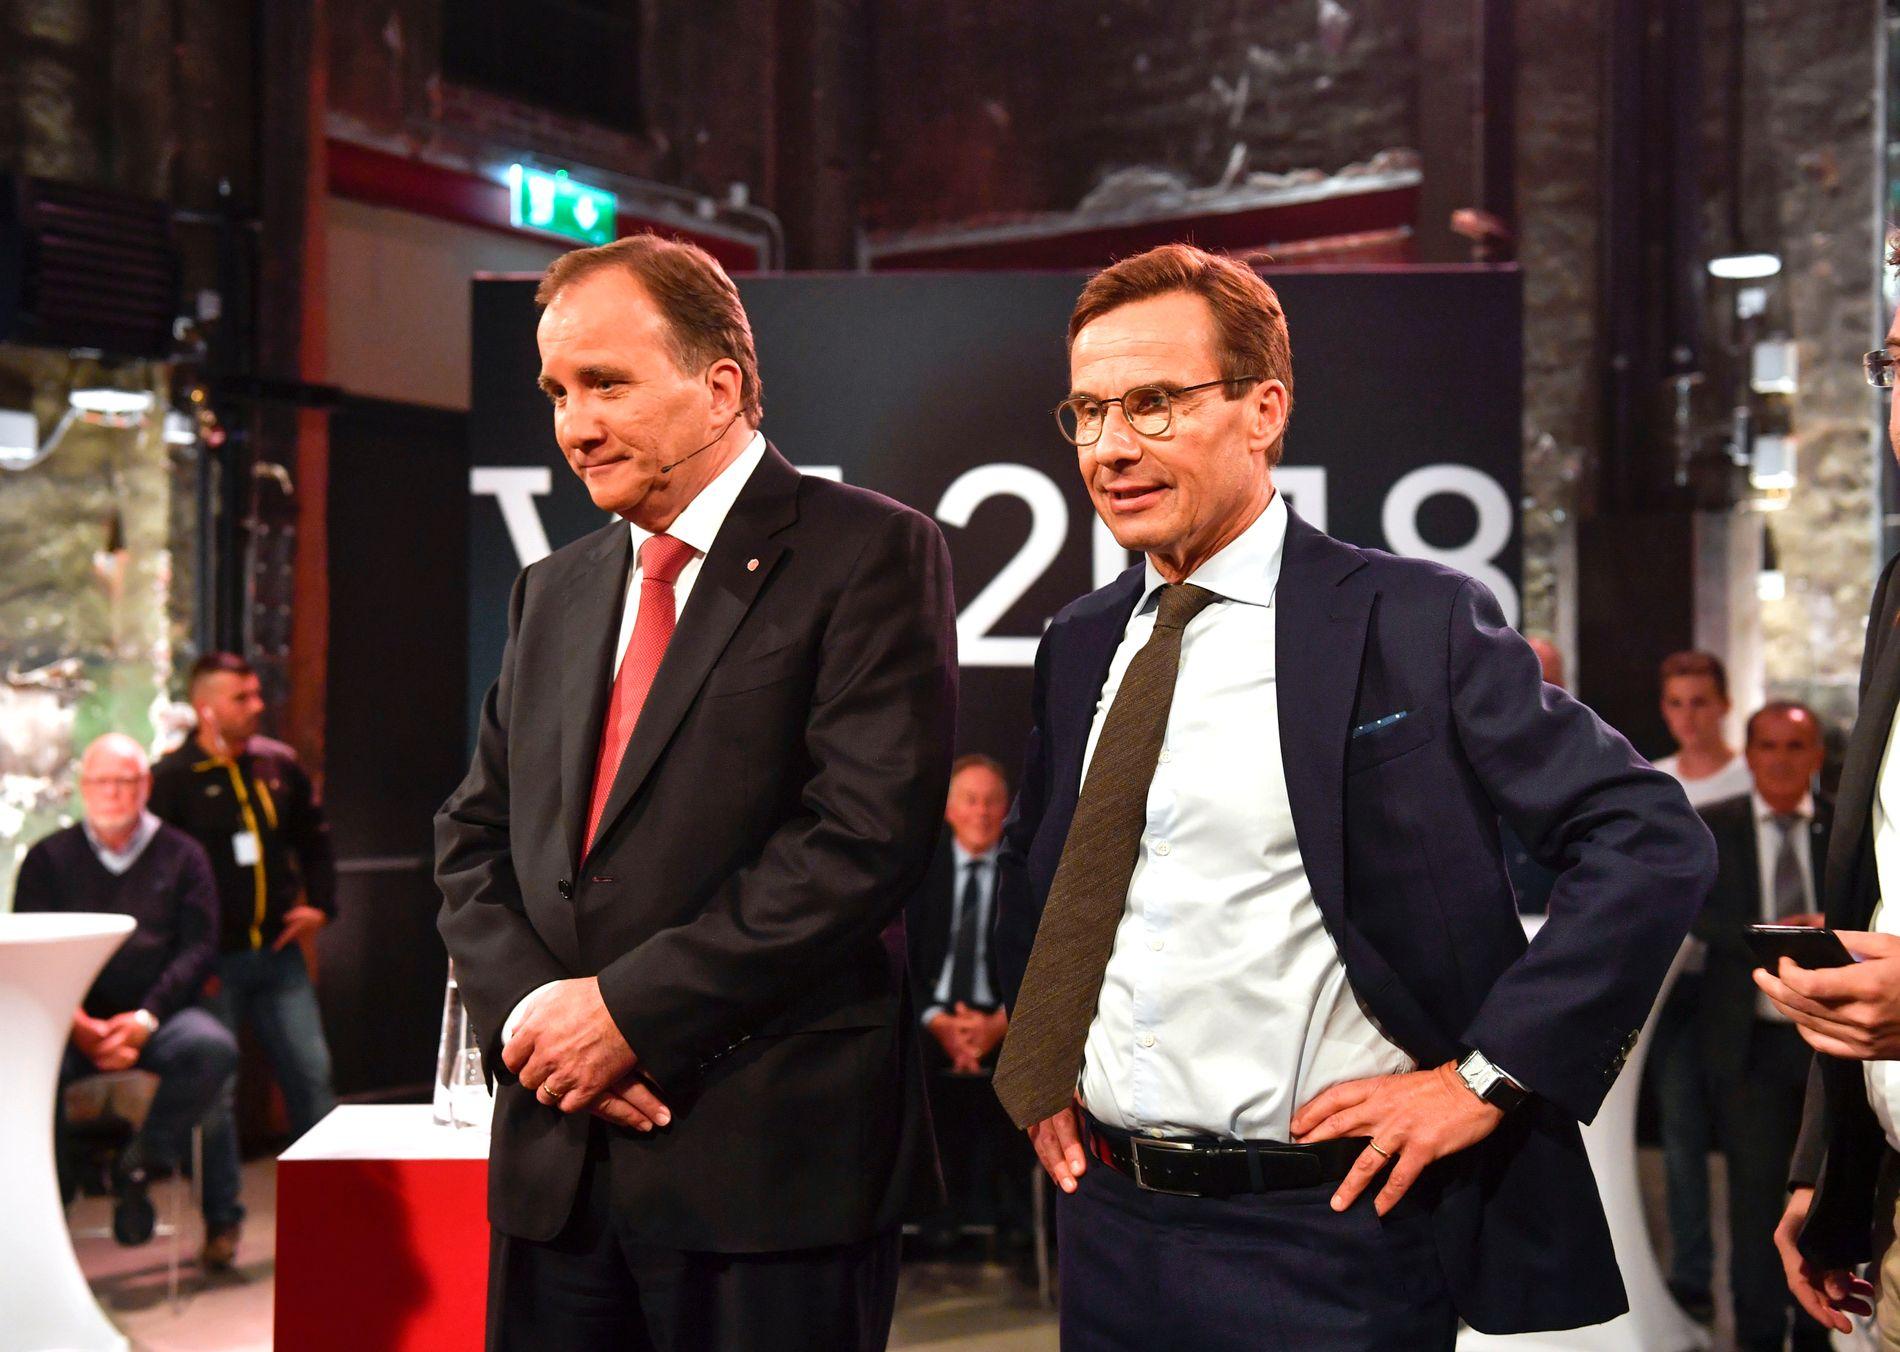 HVEM VINNER? Statsminister Stefan Löfven (til venstre) sammen med Moderaternas leder Ulf Kristersson i valgduell på svensk TV 31-august.